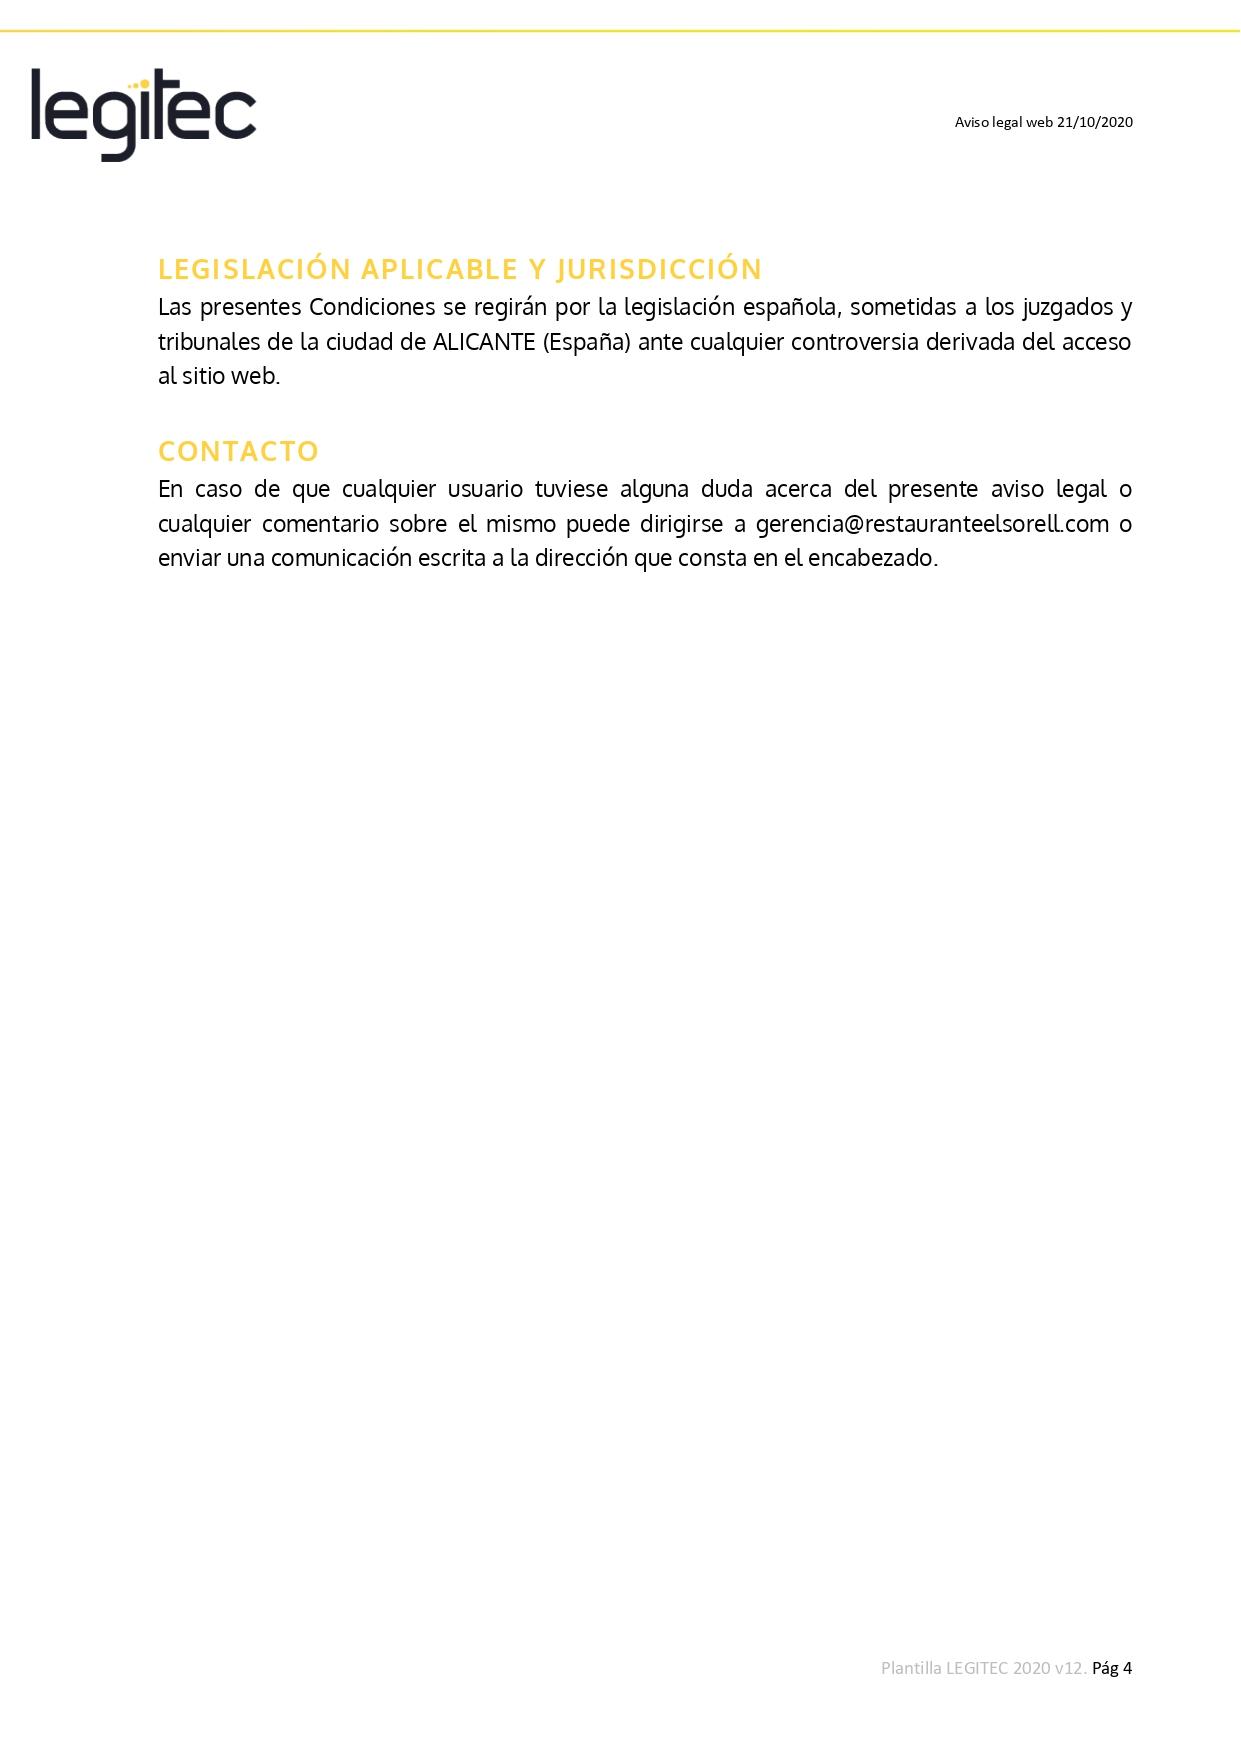 WEB-AVISO-LEGAL_page-0004